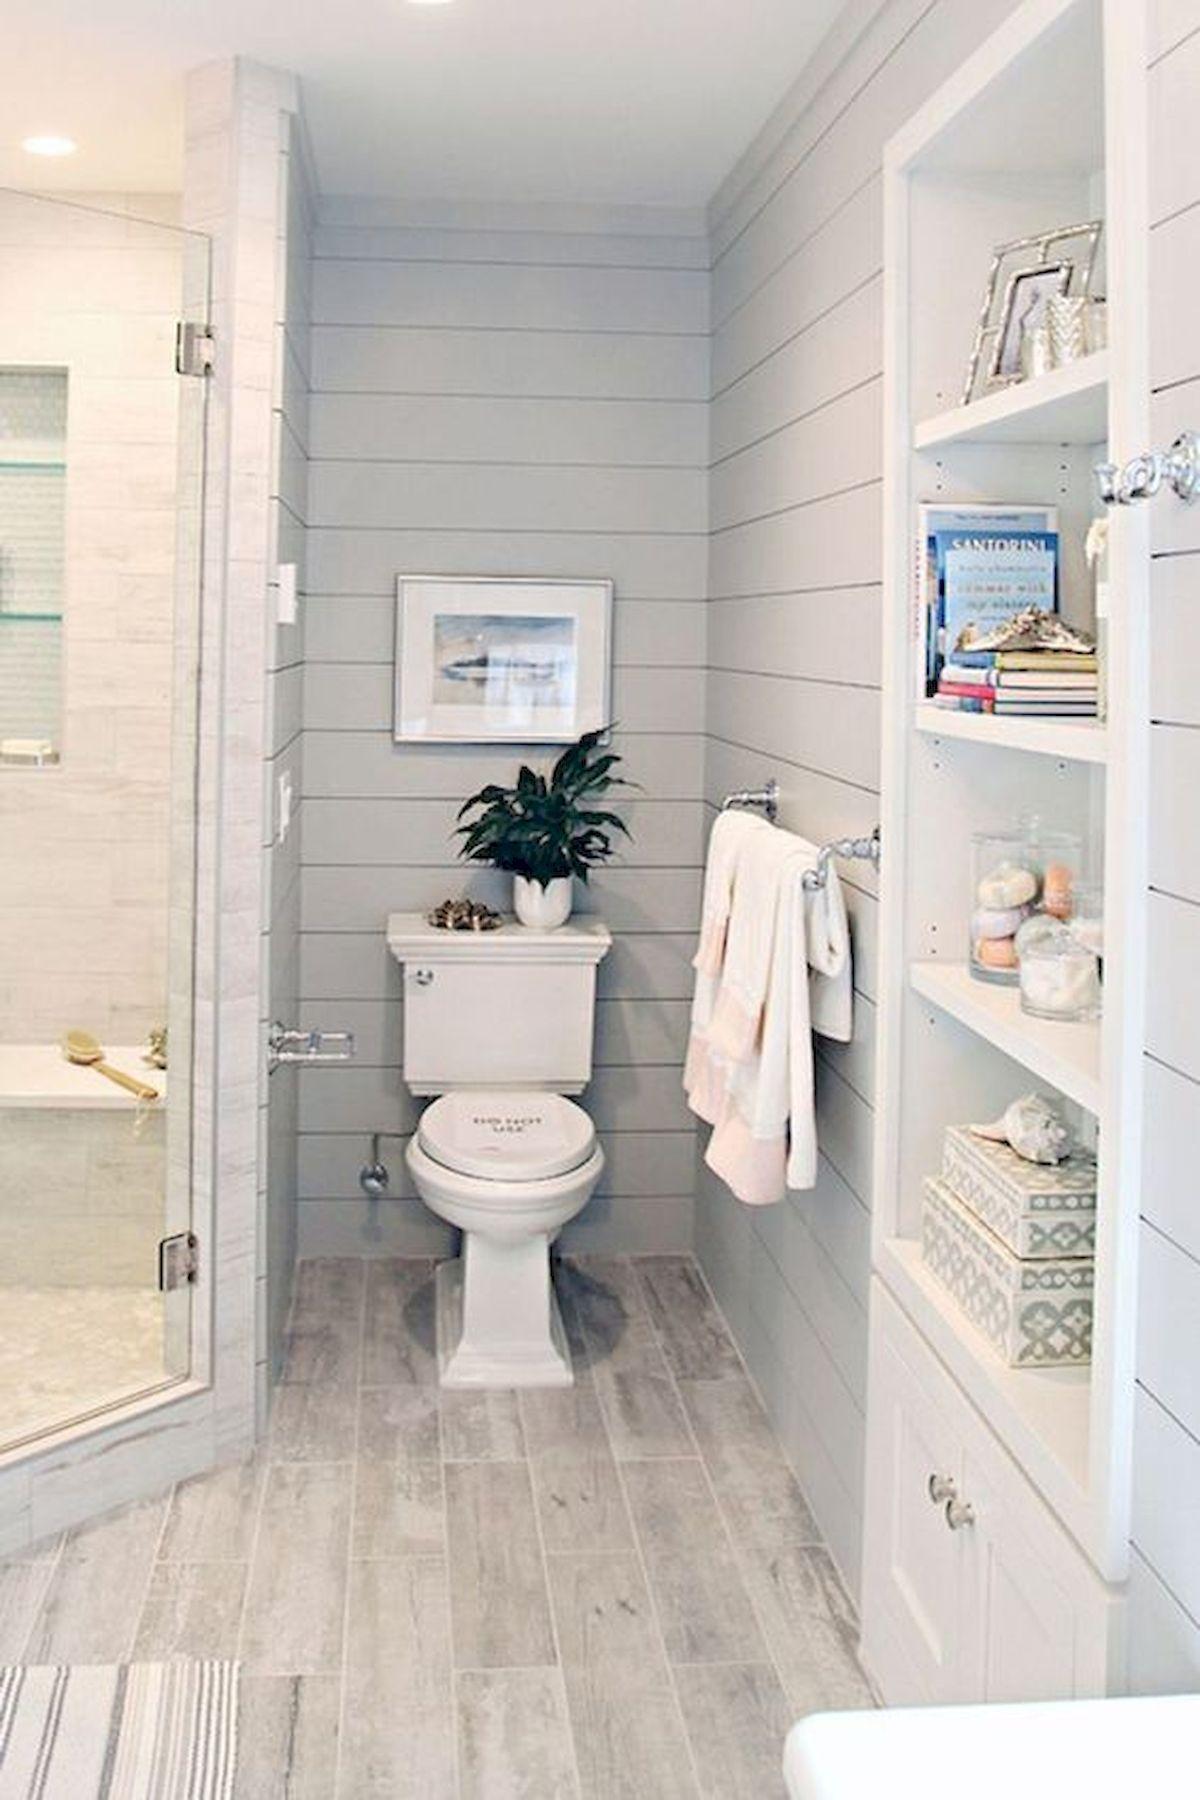 60 elegant small master bathroom remodel ideas 54 with on bathroom renovation ideas for small bathrooms id=60922